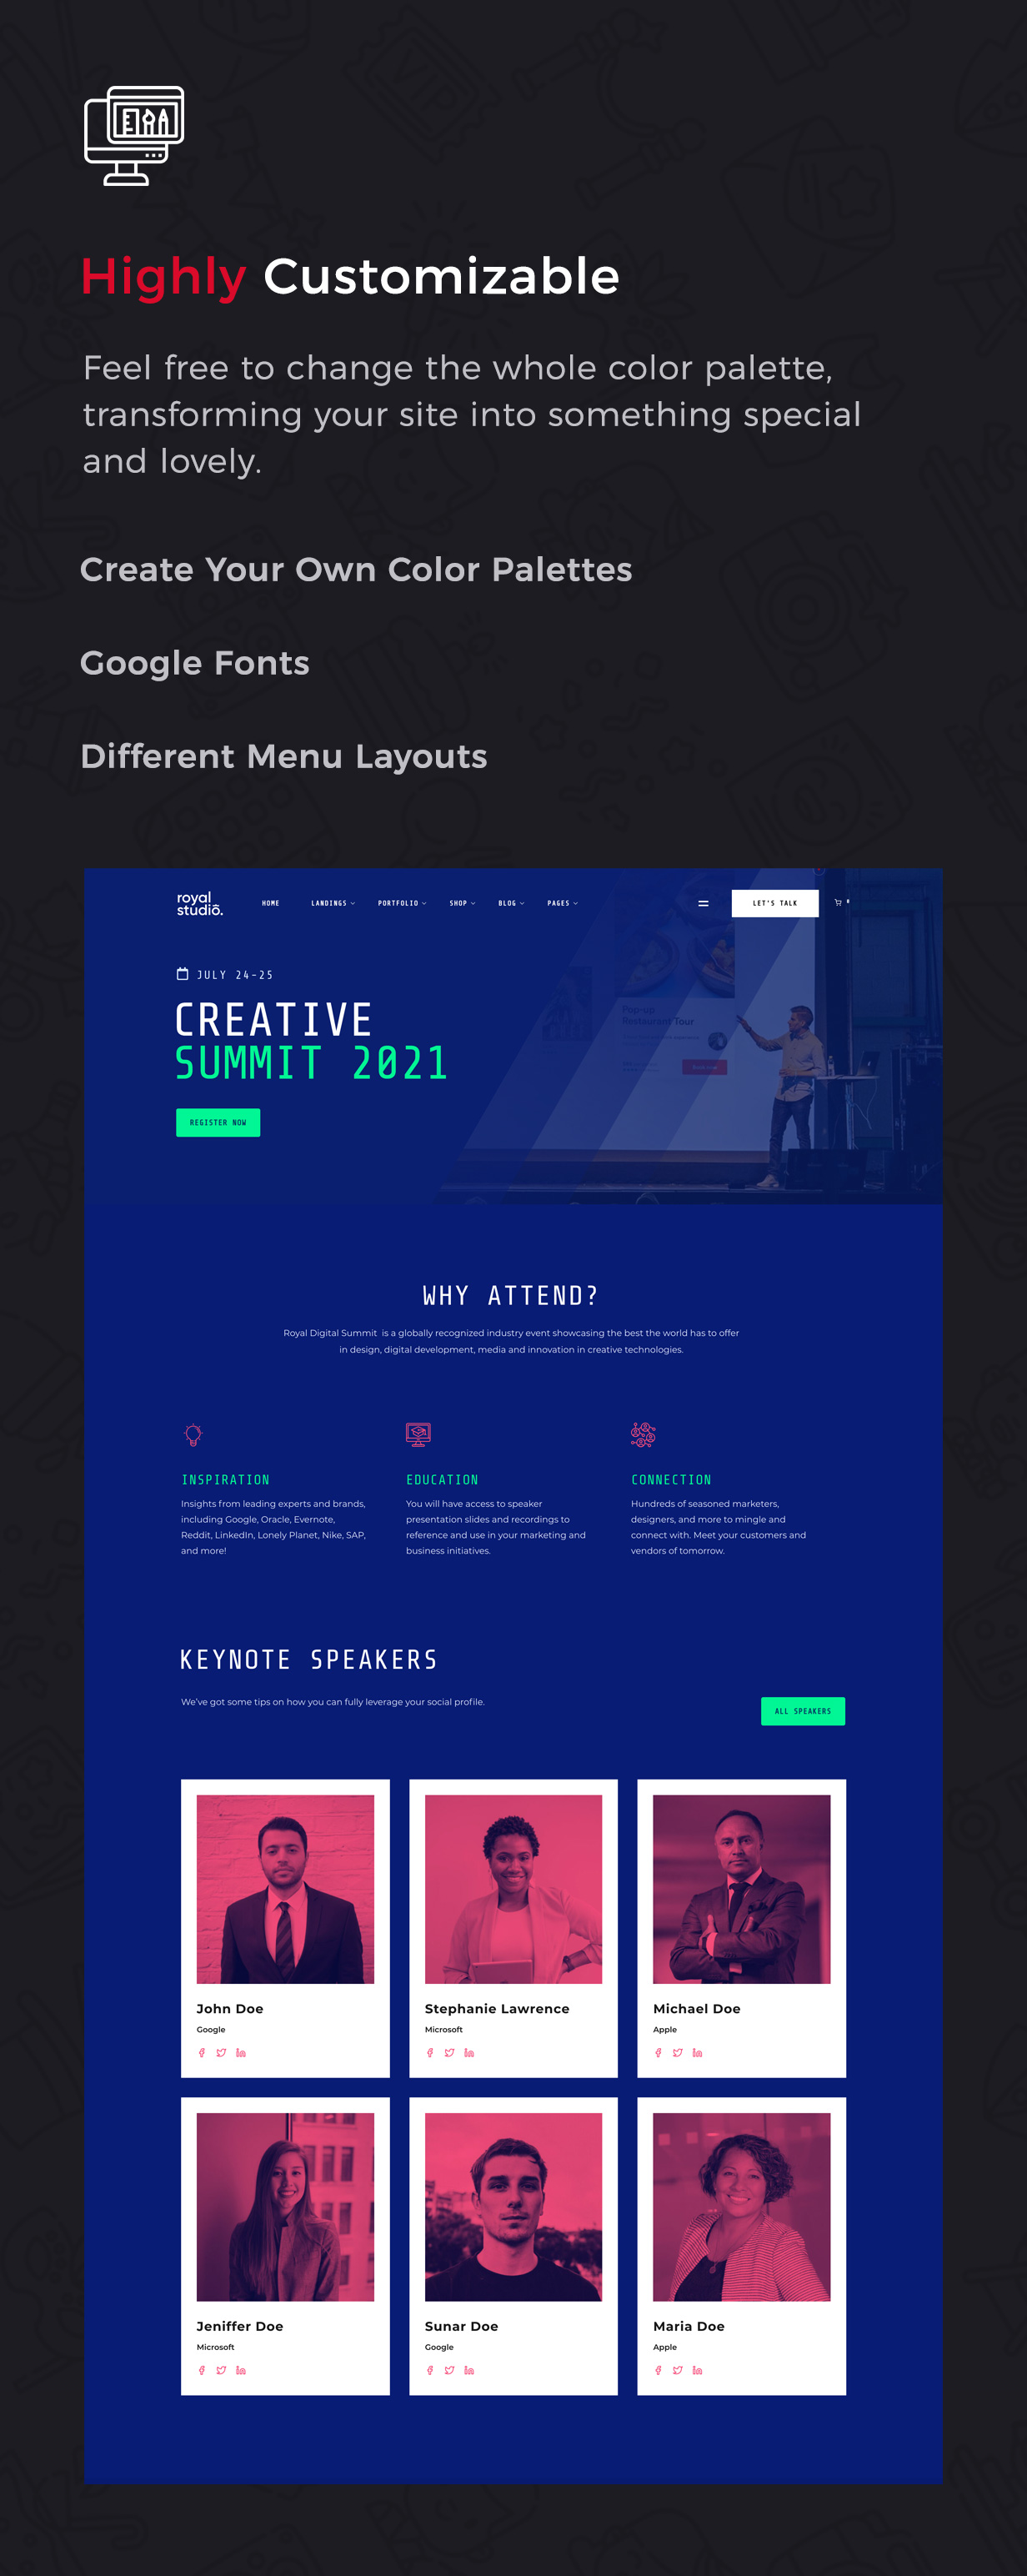 RoyalStudio - Agency & Marketing Theme - 9